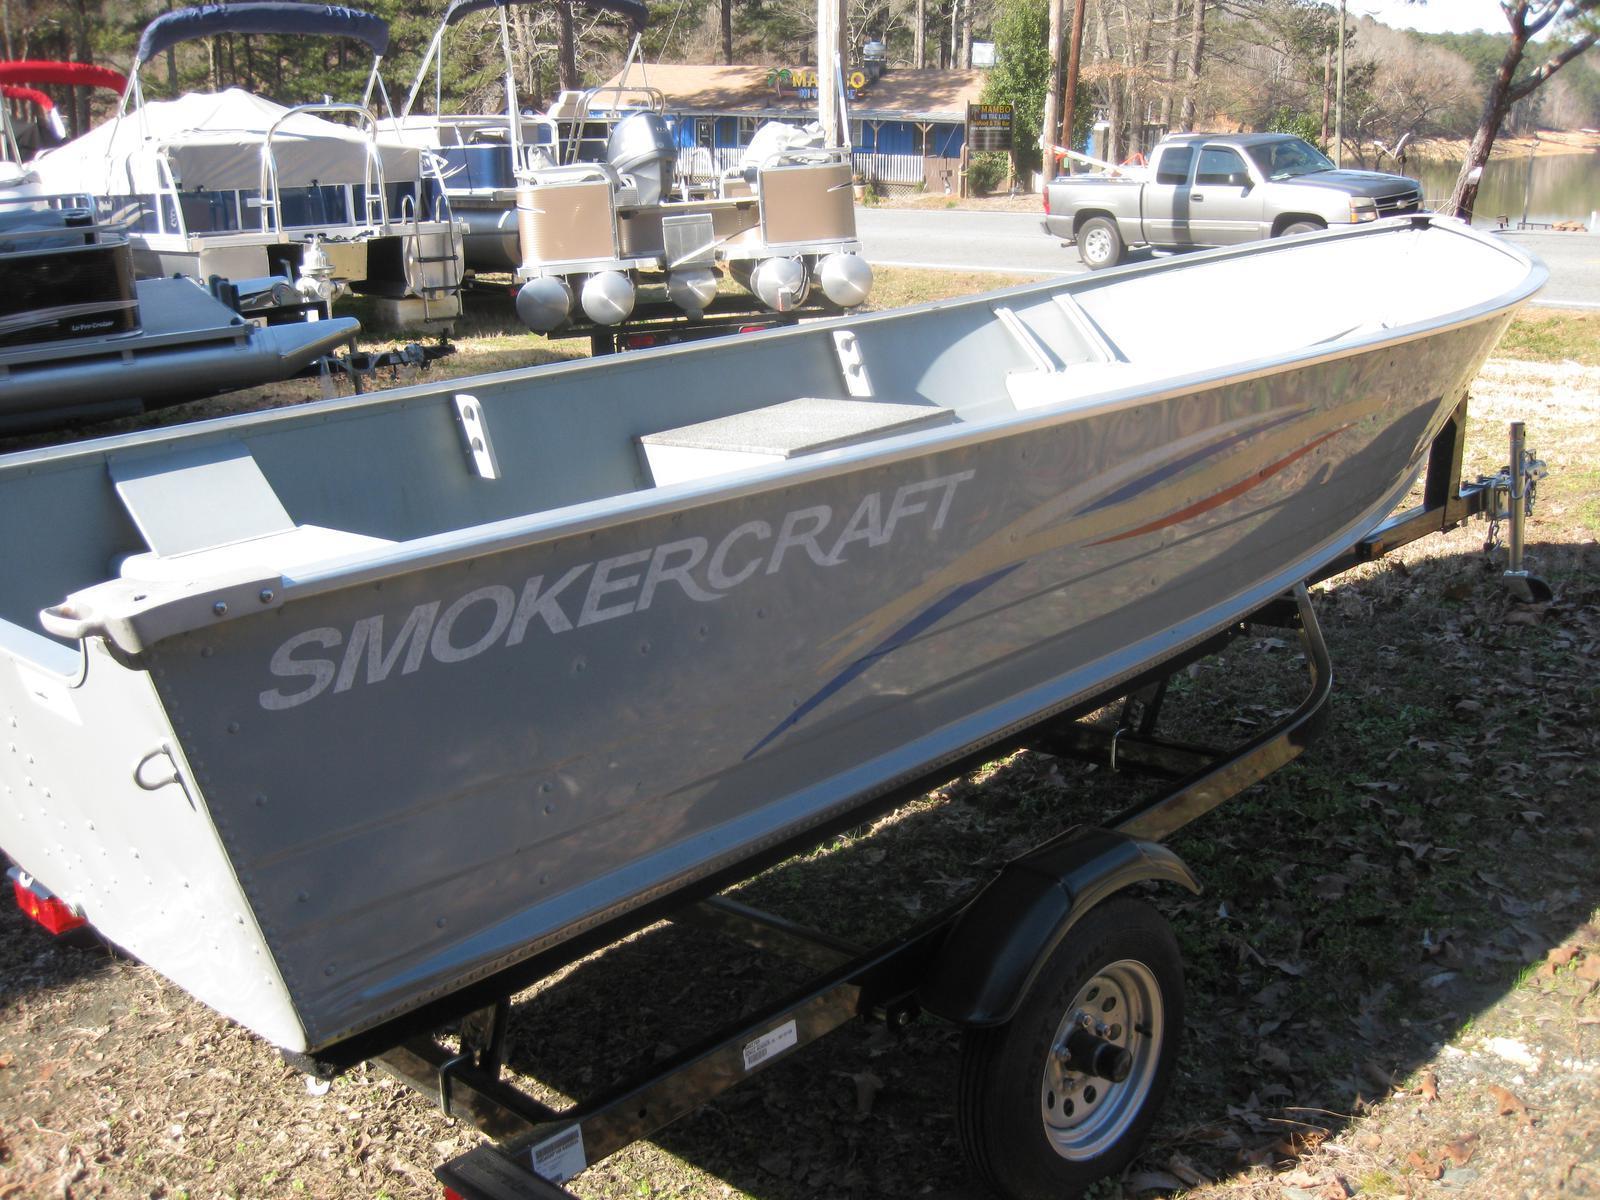 Smoker-craft Alaskan 15 DLX